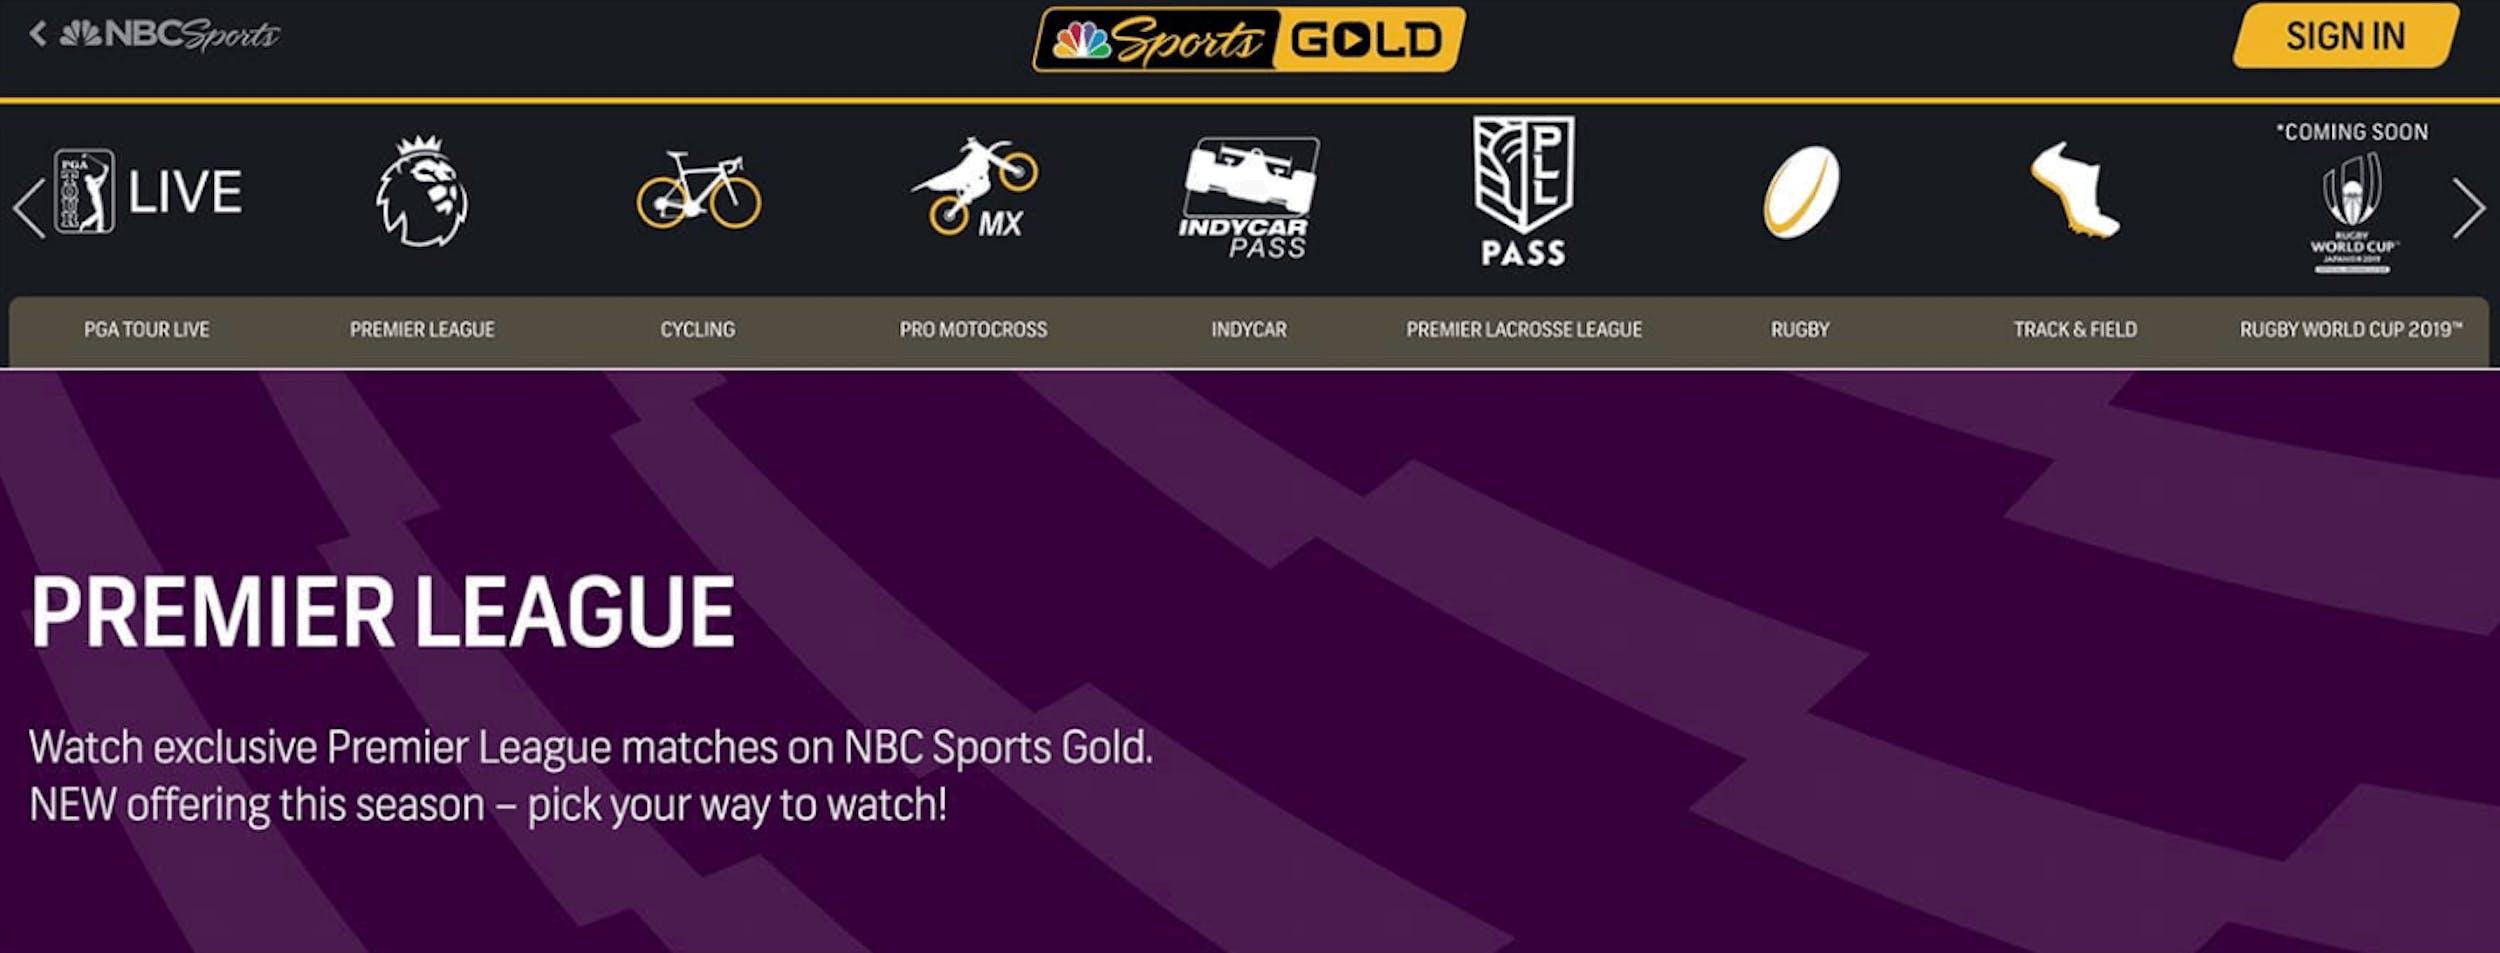 man uniteed vs spurs live stream nbc sports gold